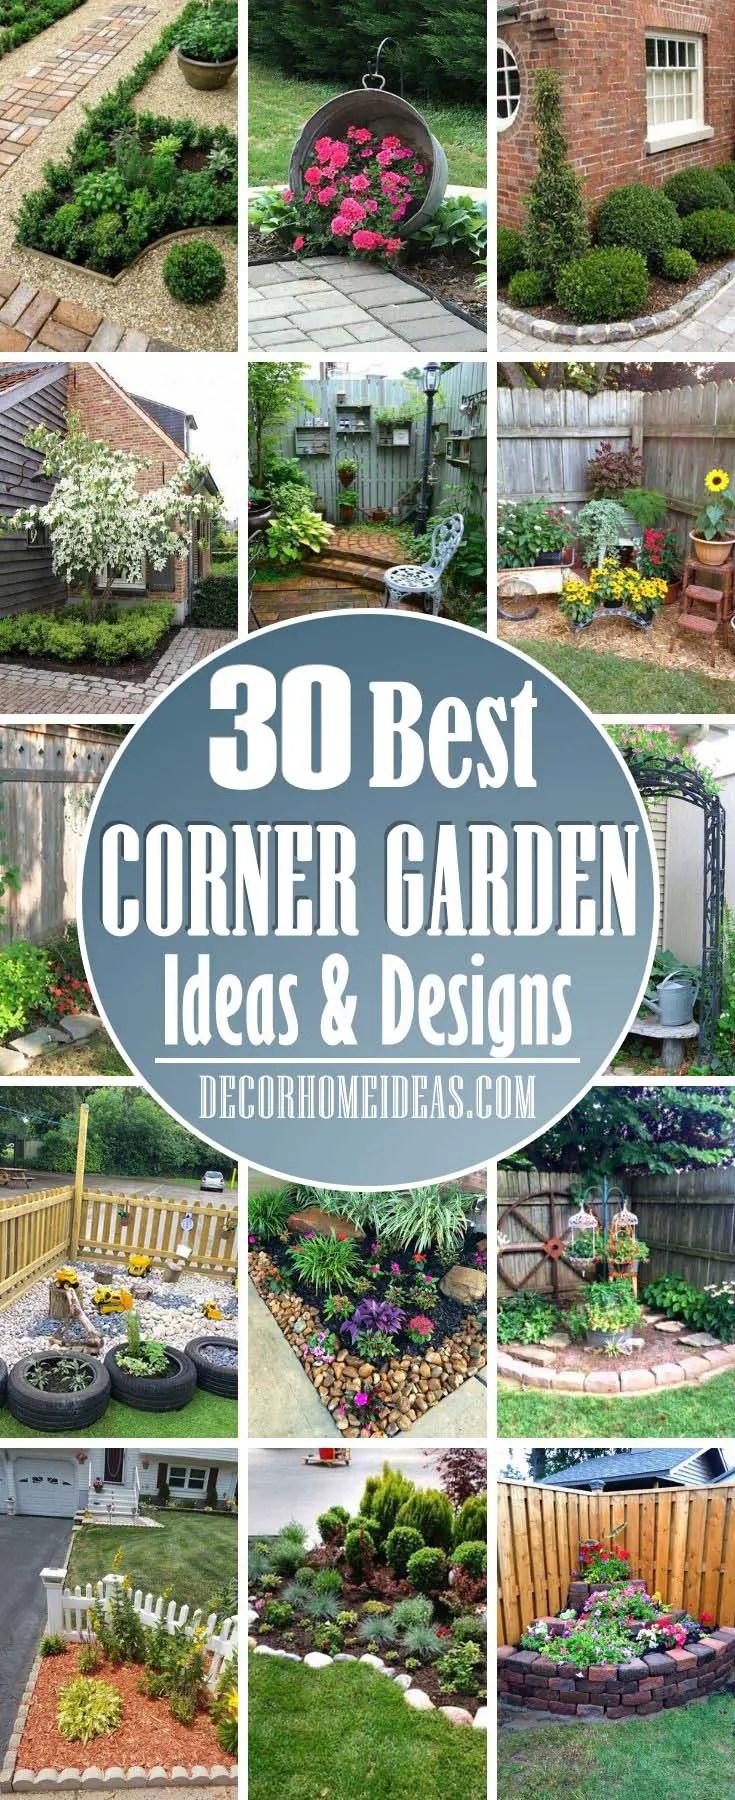 28 Beautiful Corner Garden Ideas And Designs Decor Home Ideas